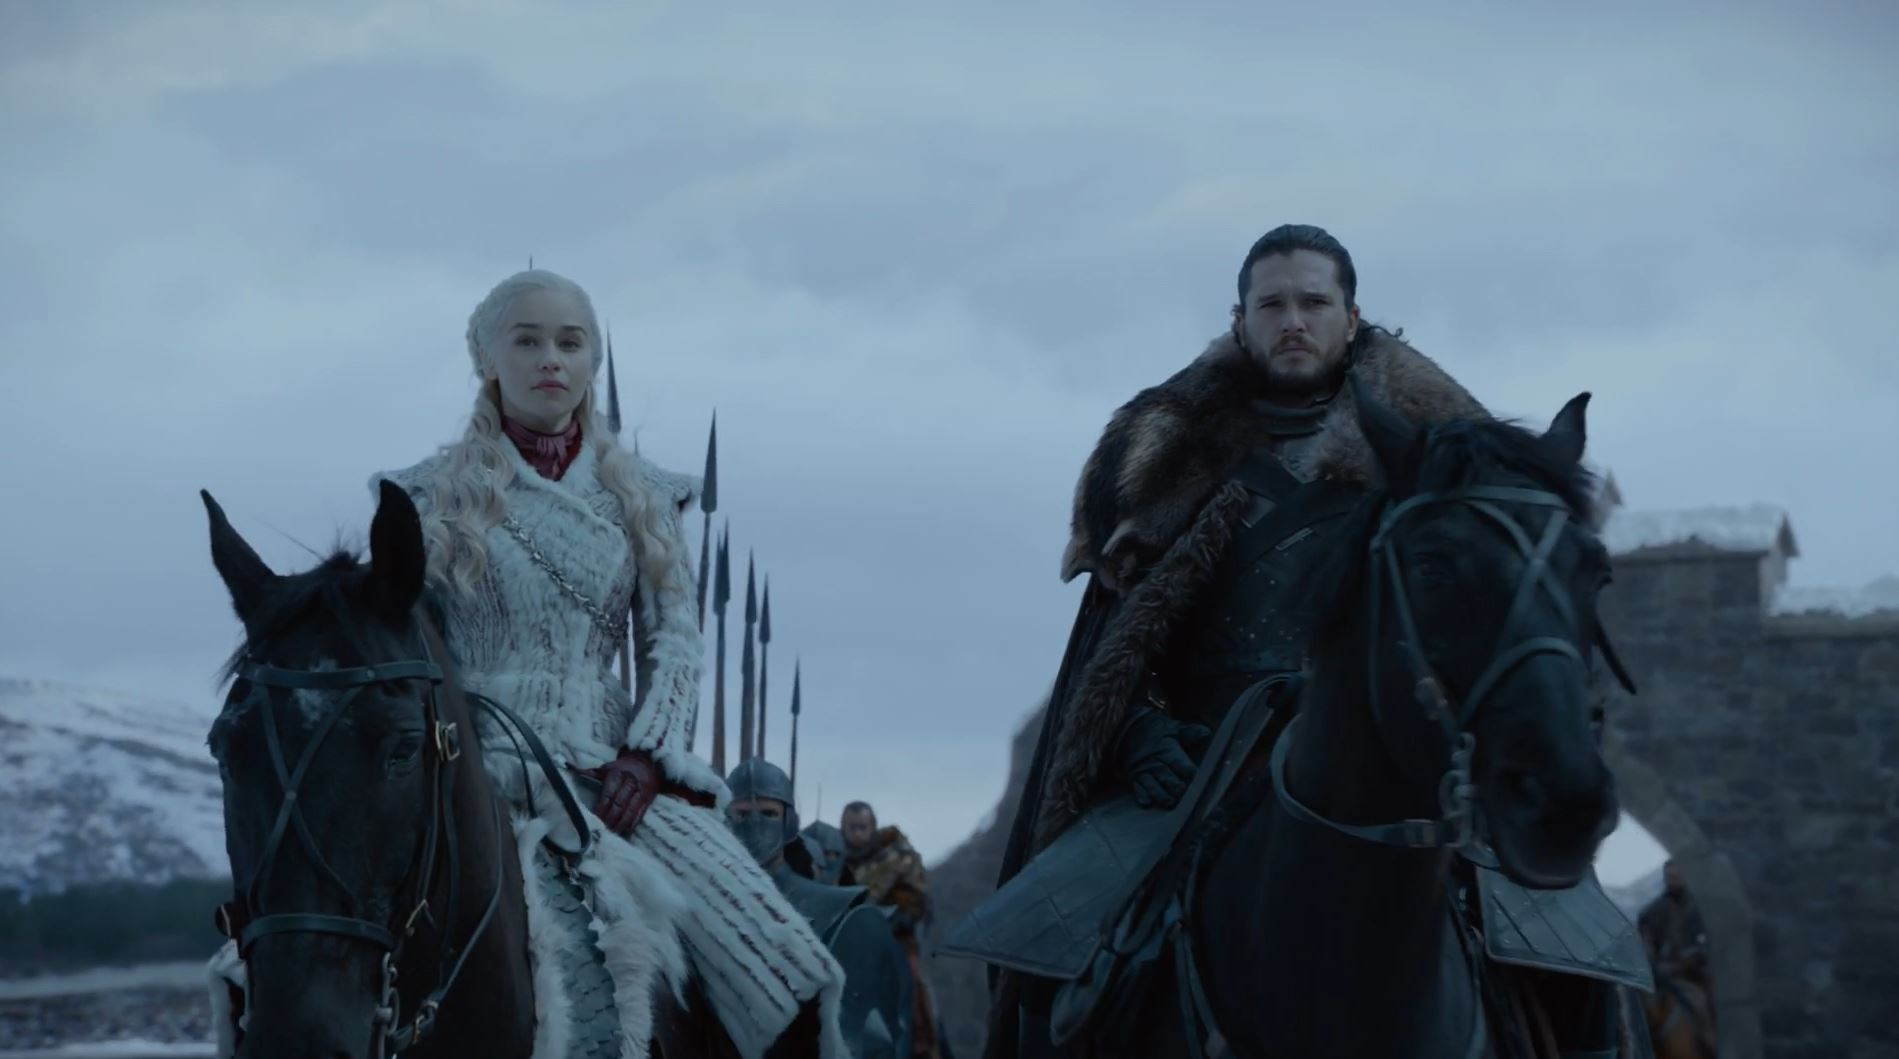 Game of Thrones temporada 8, análise do episódio 1 e resumo: Winterfell